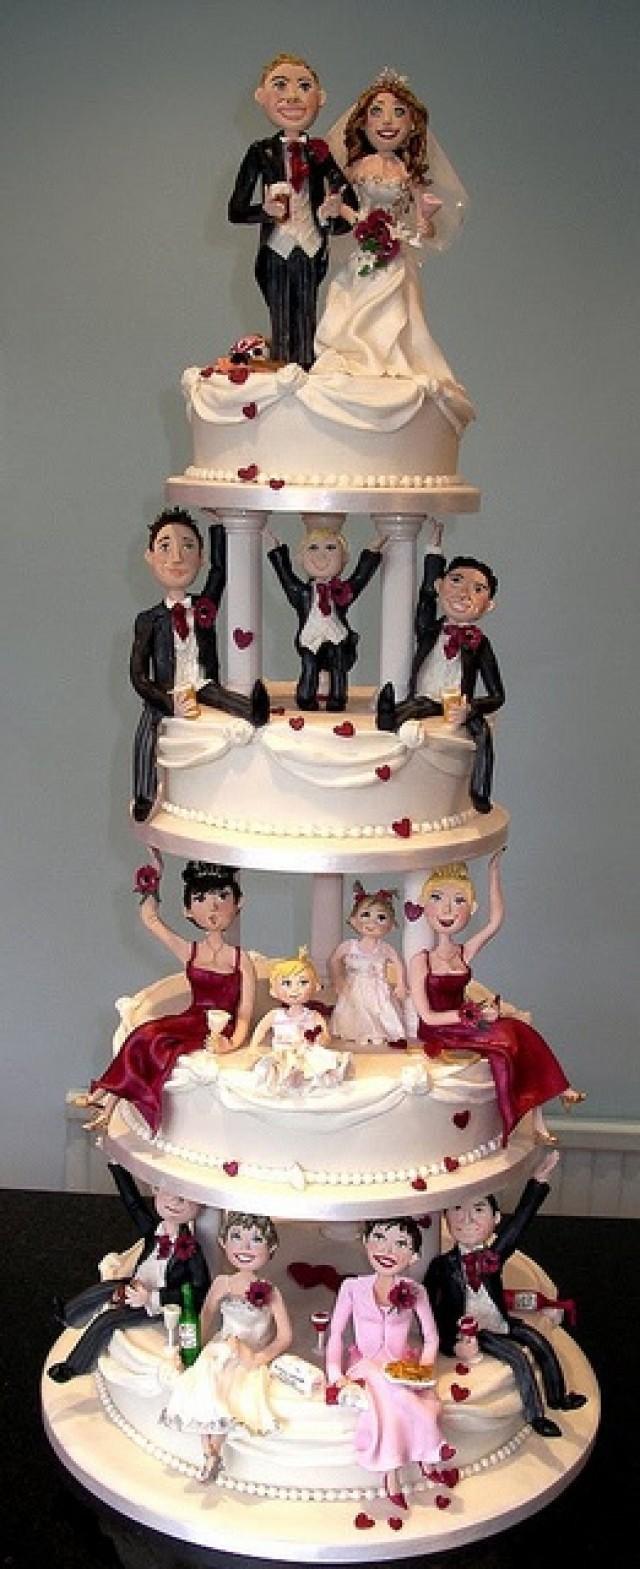 Cool Wedding Cakes  Wedding Cakes Unique Party Wedding Cake Awesome